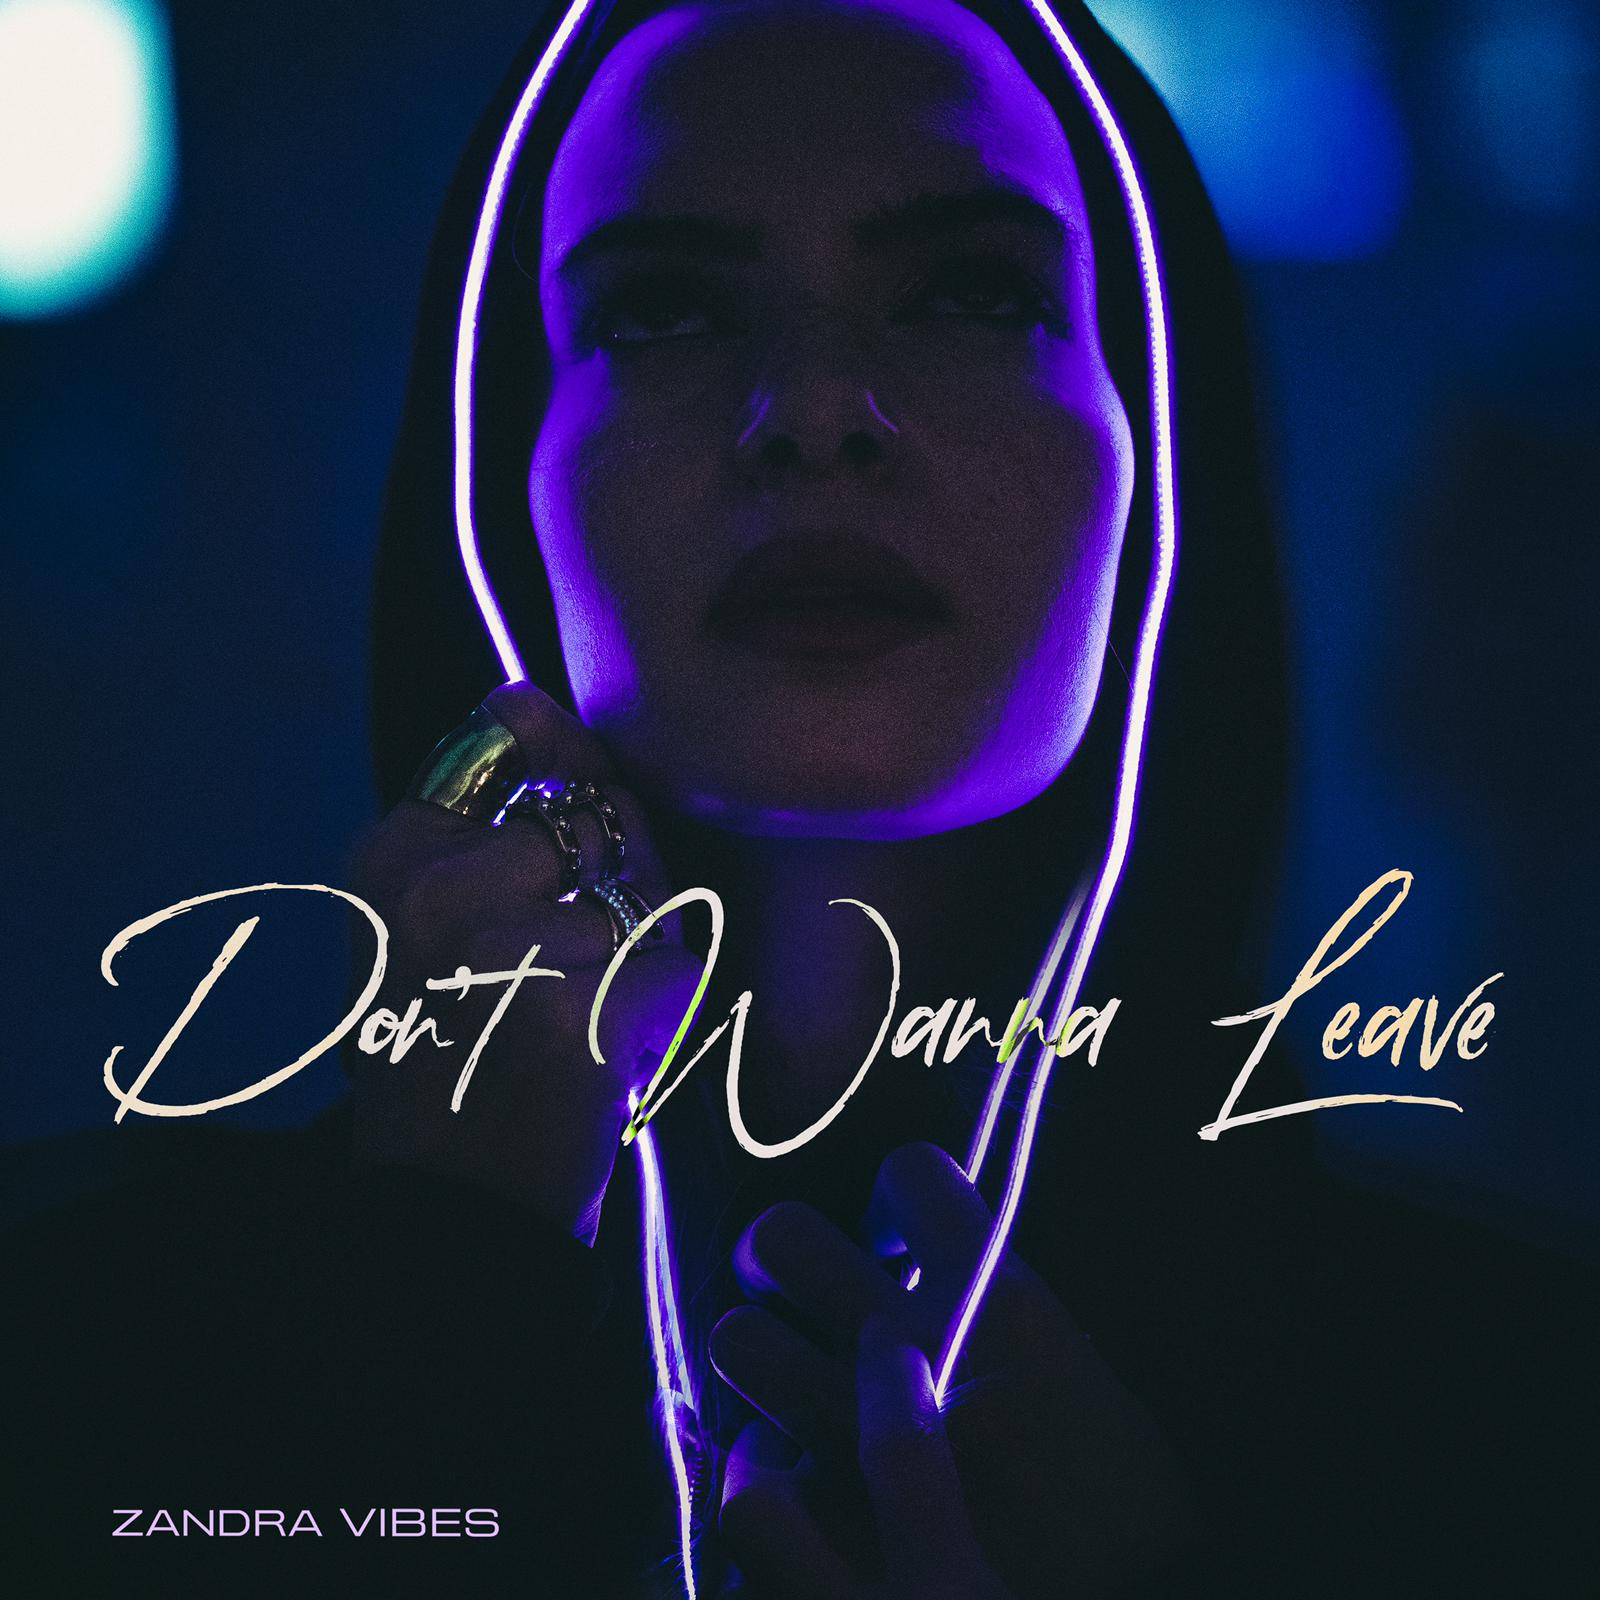 Interview with alternative R&B artist Zandra Vibes